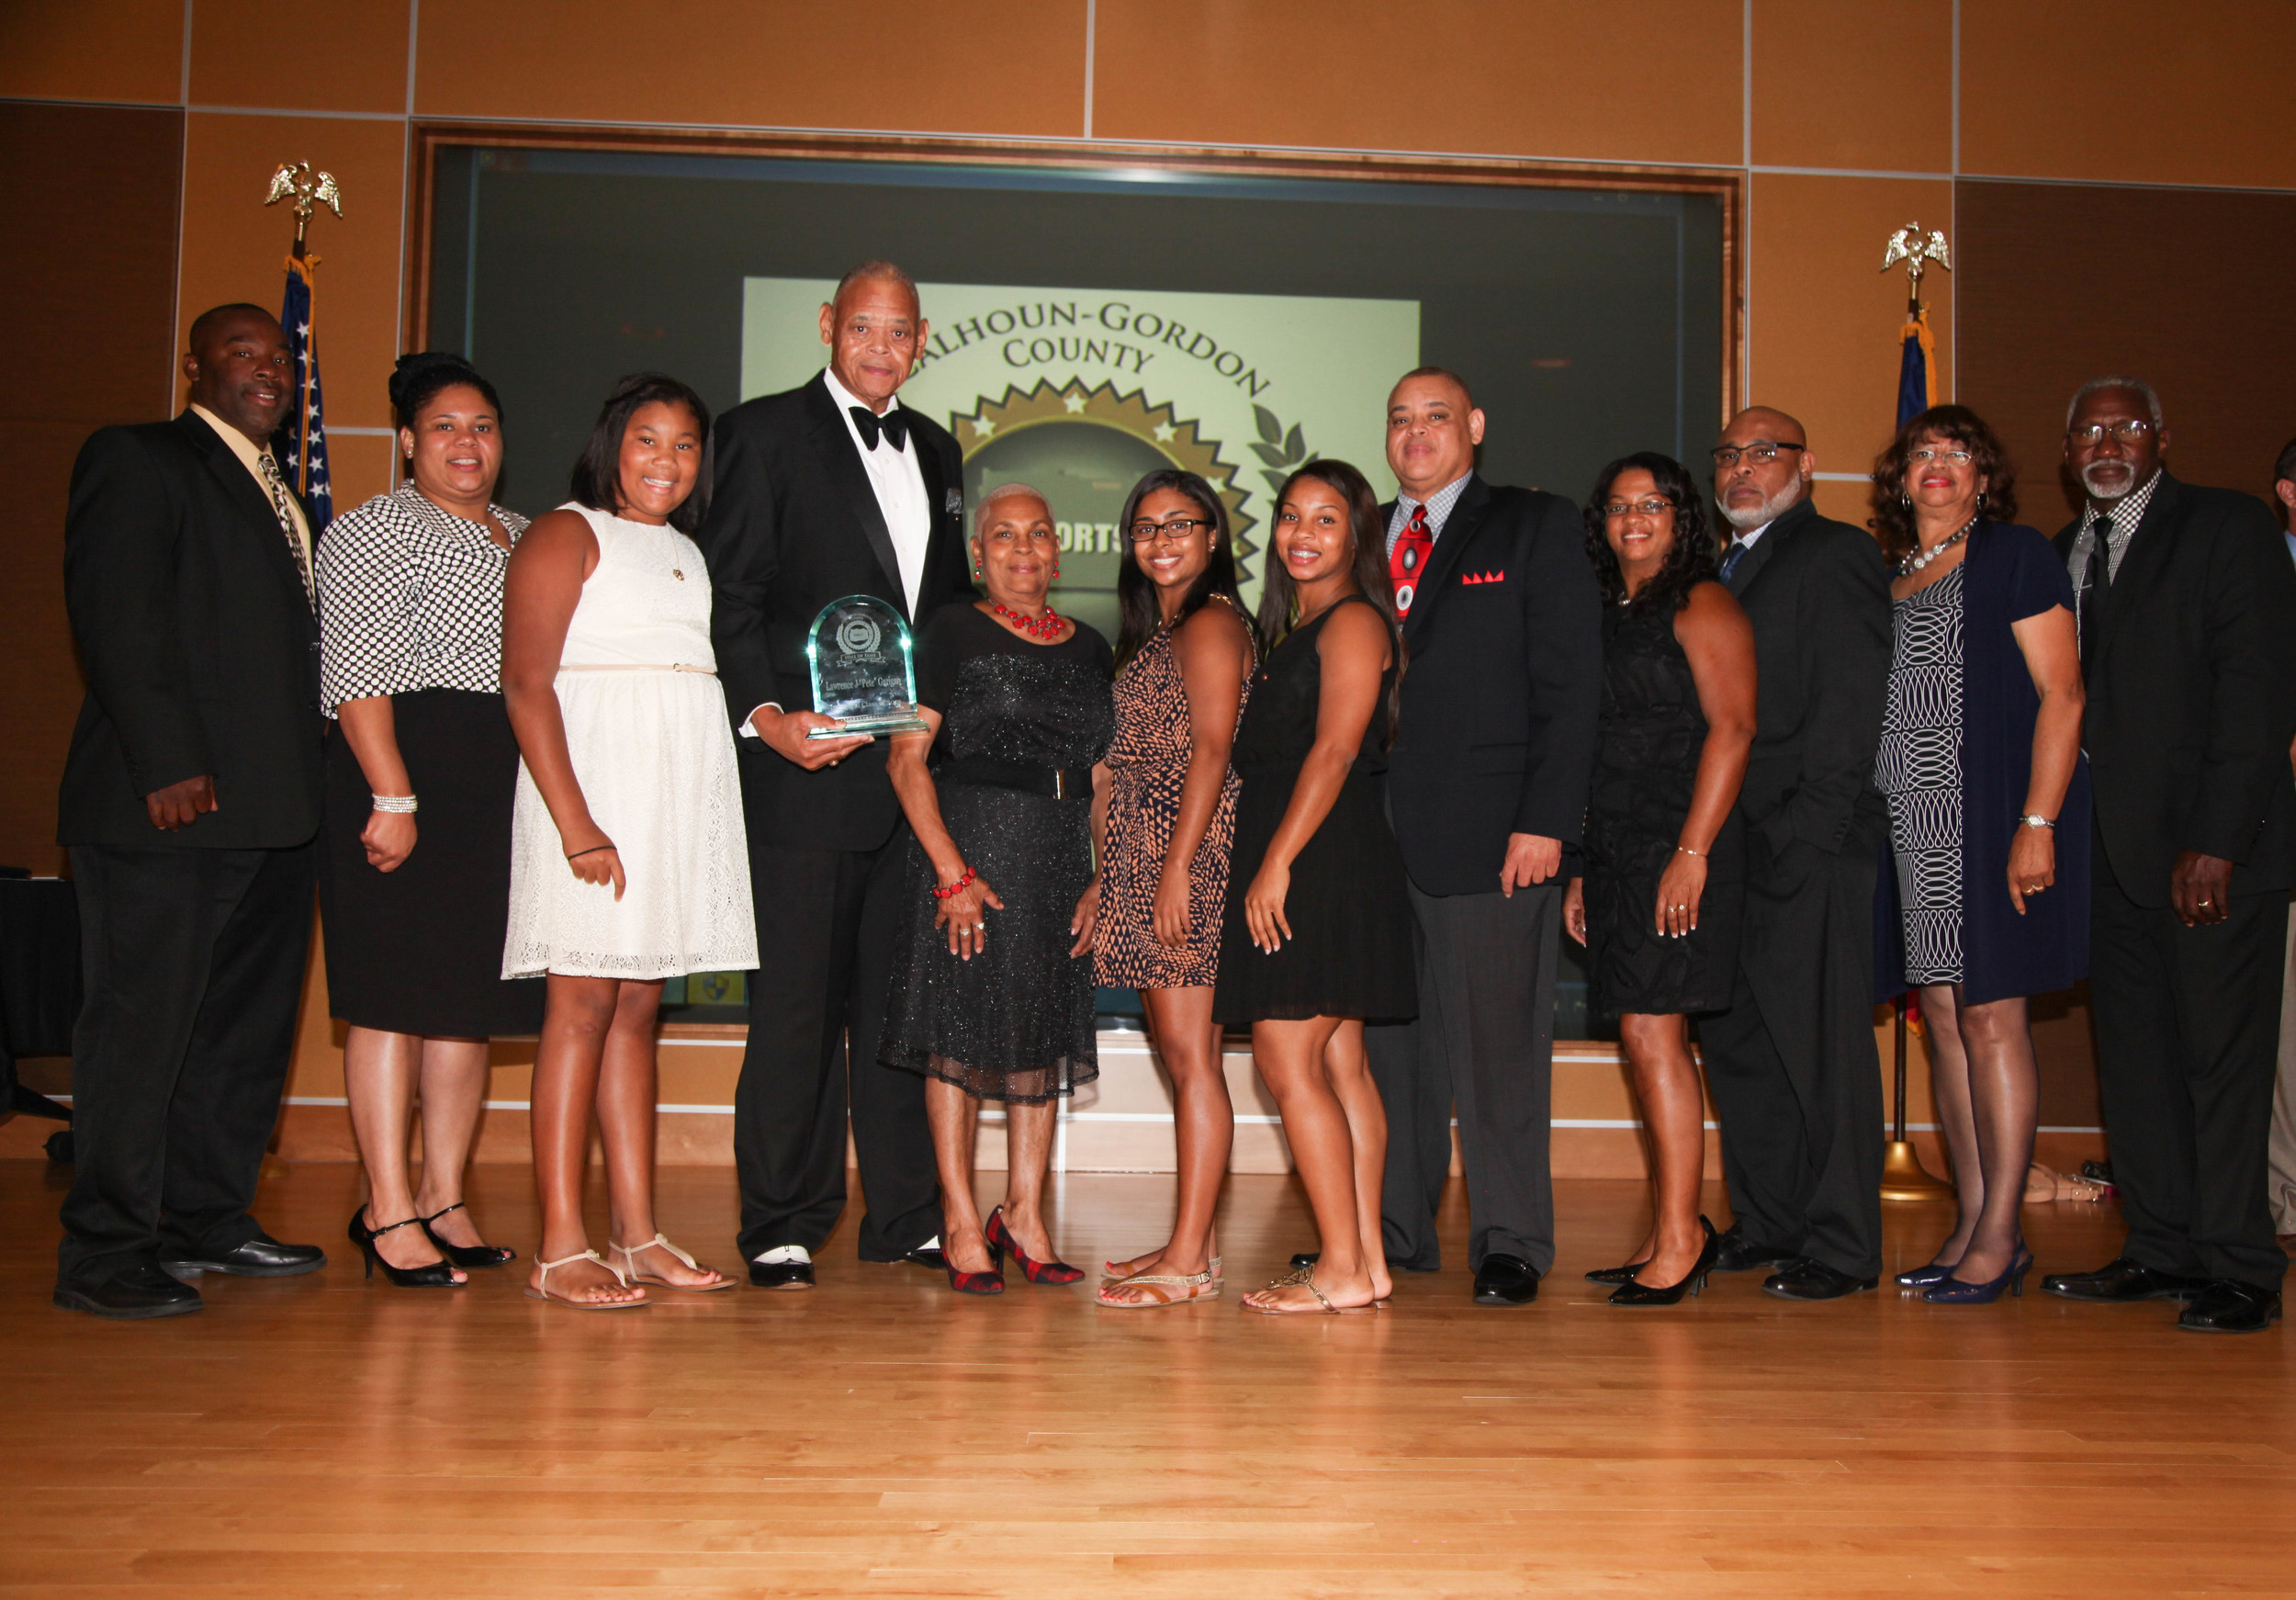 Calhoun-Gordon-County-Sports-Hall-of-Fame-2015-203.jpg